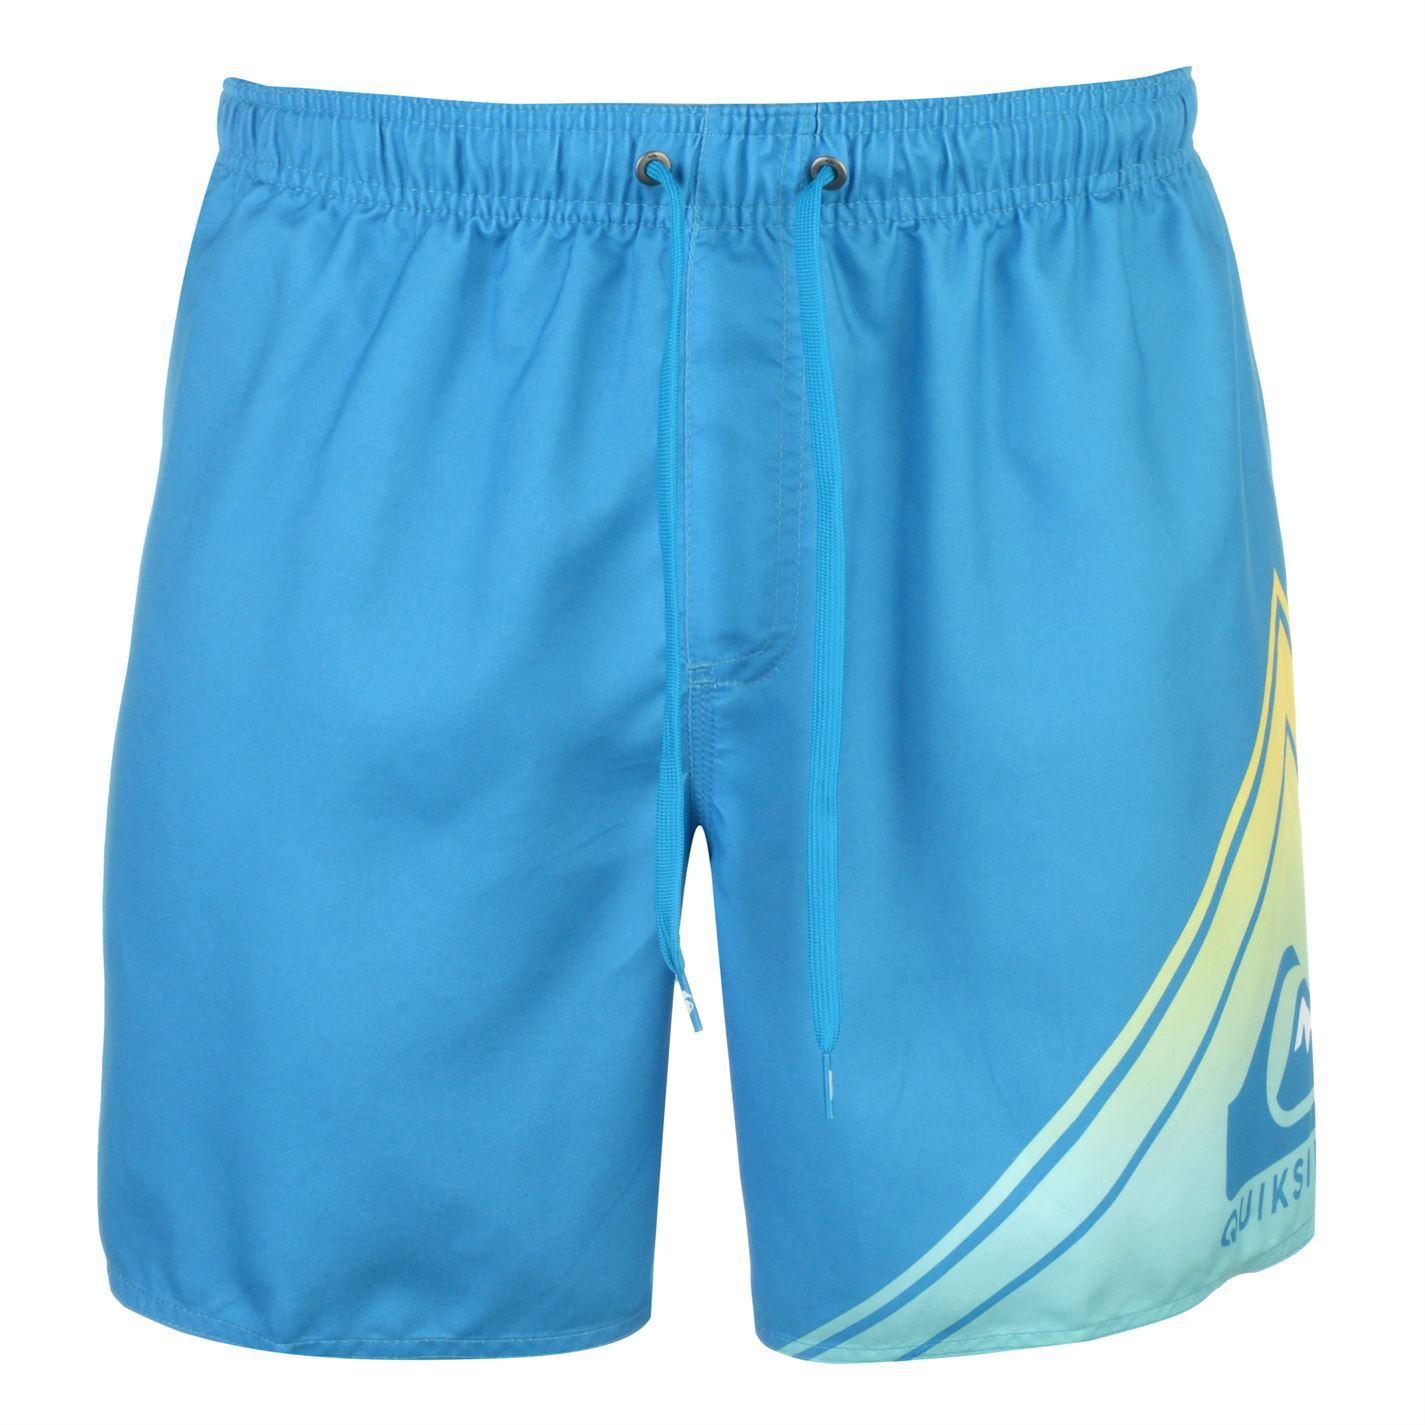 abb1ed2afddb Detalles de Quiksilver Ondulación One Boardshorts Hombre Pantalones Traje  de Play o Baño